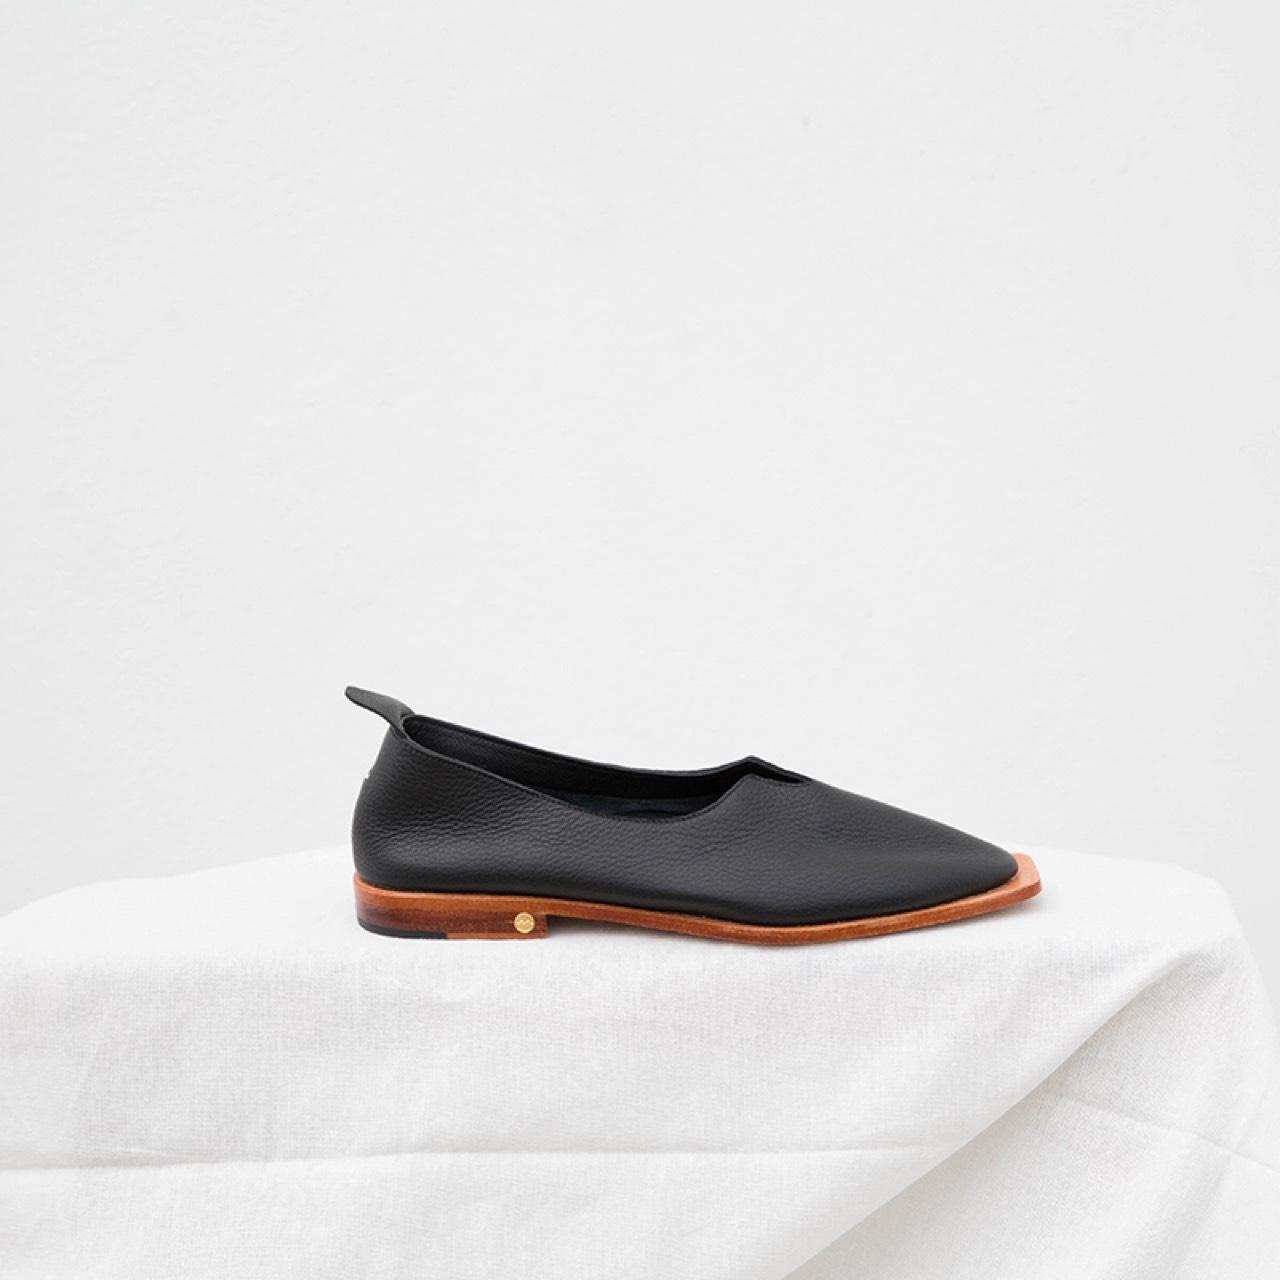 Oysterfootwear,women,รองเท้า,รองเท้าผู้หญิง,รองเท้าหุ้มส้น,รองเท้าสีดำ